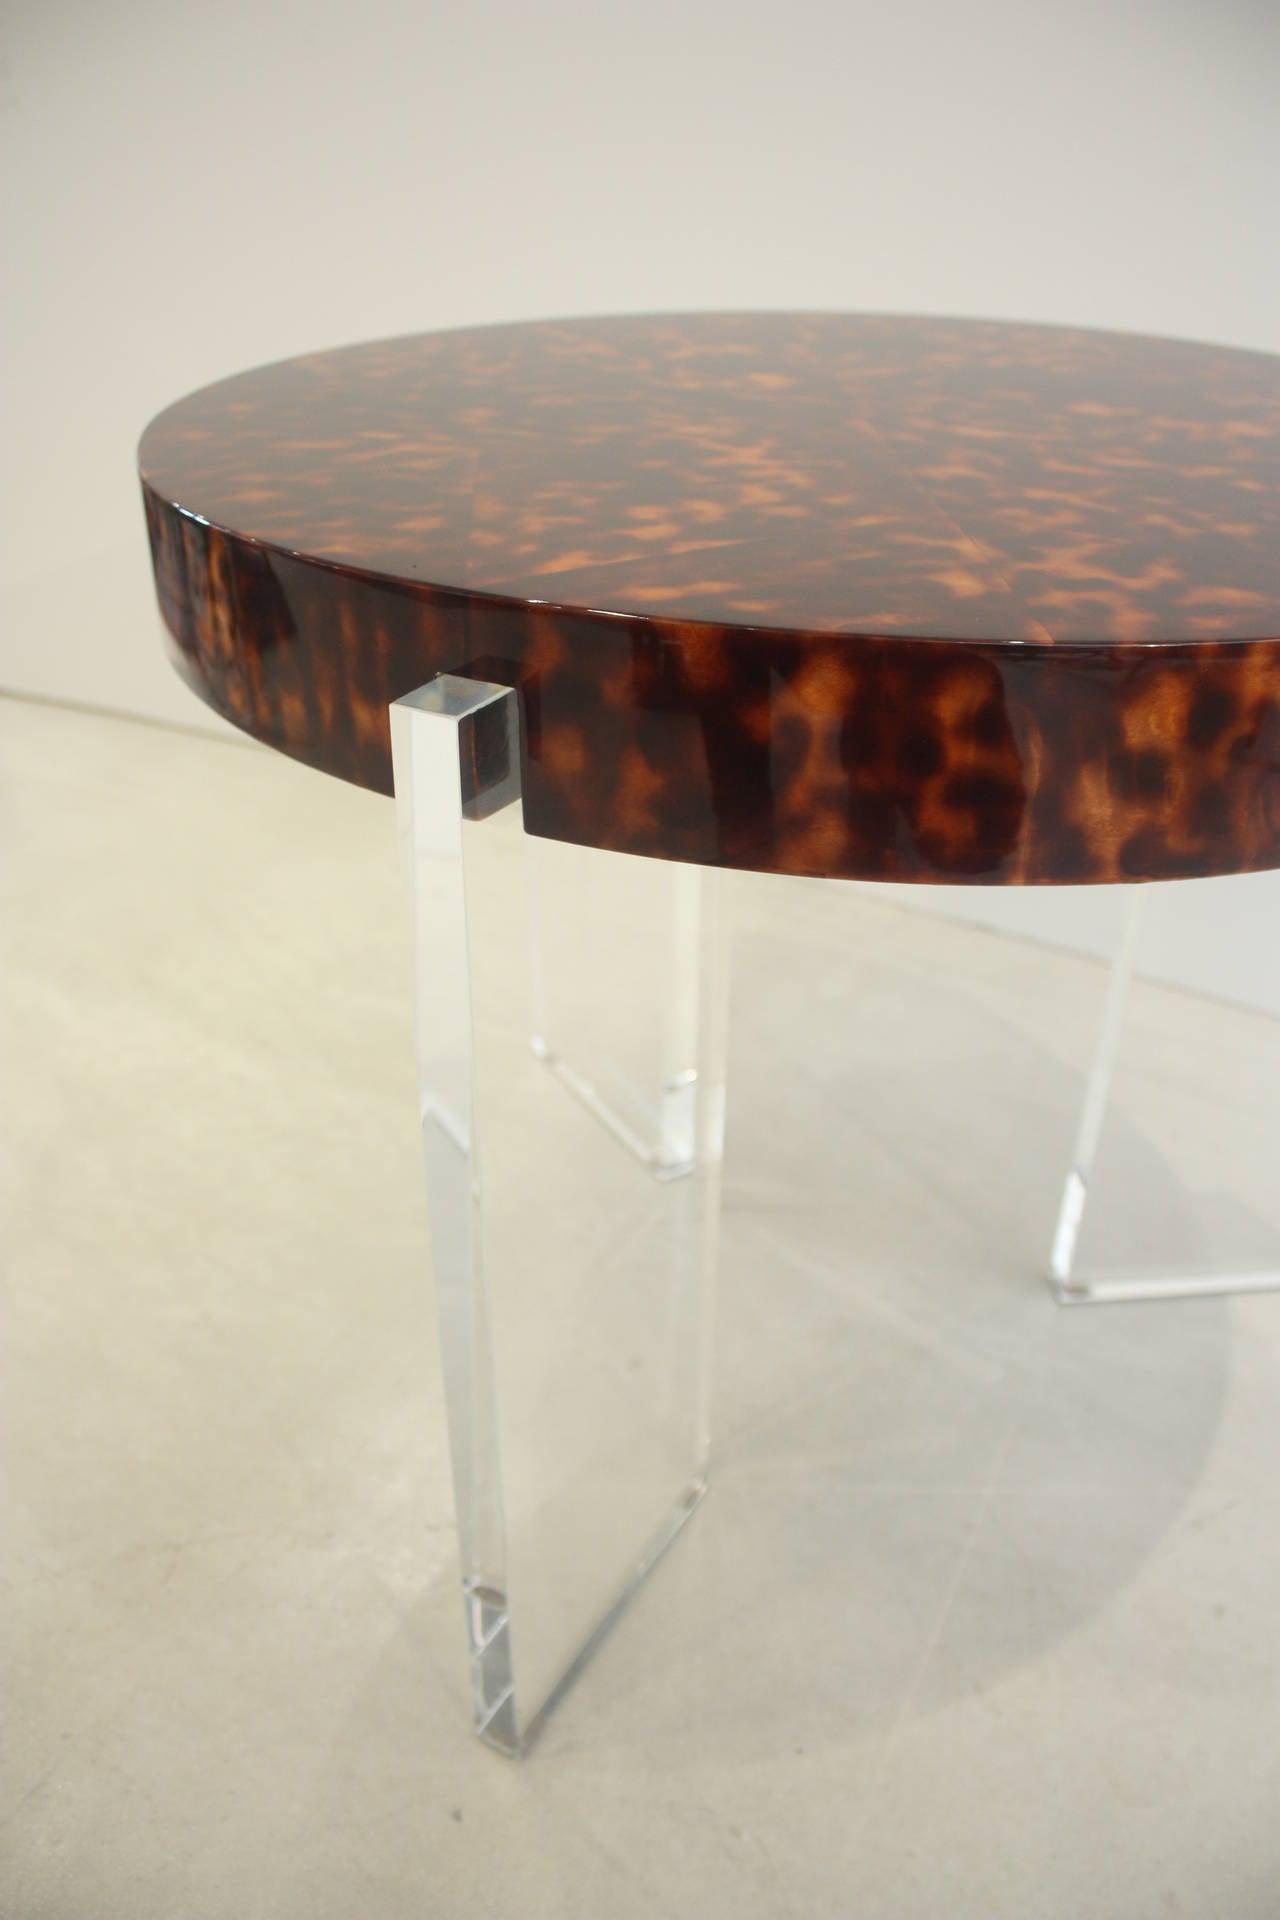 Liz O'Brien Editions, the Sam Table, Modern Side Table 3